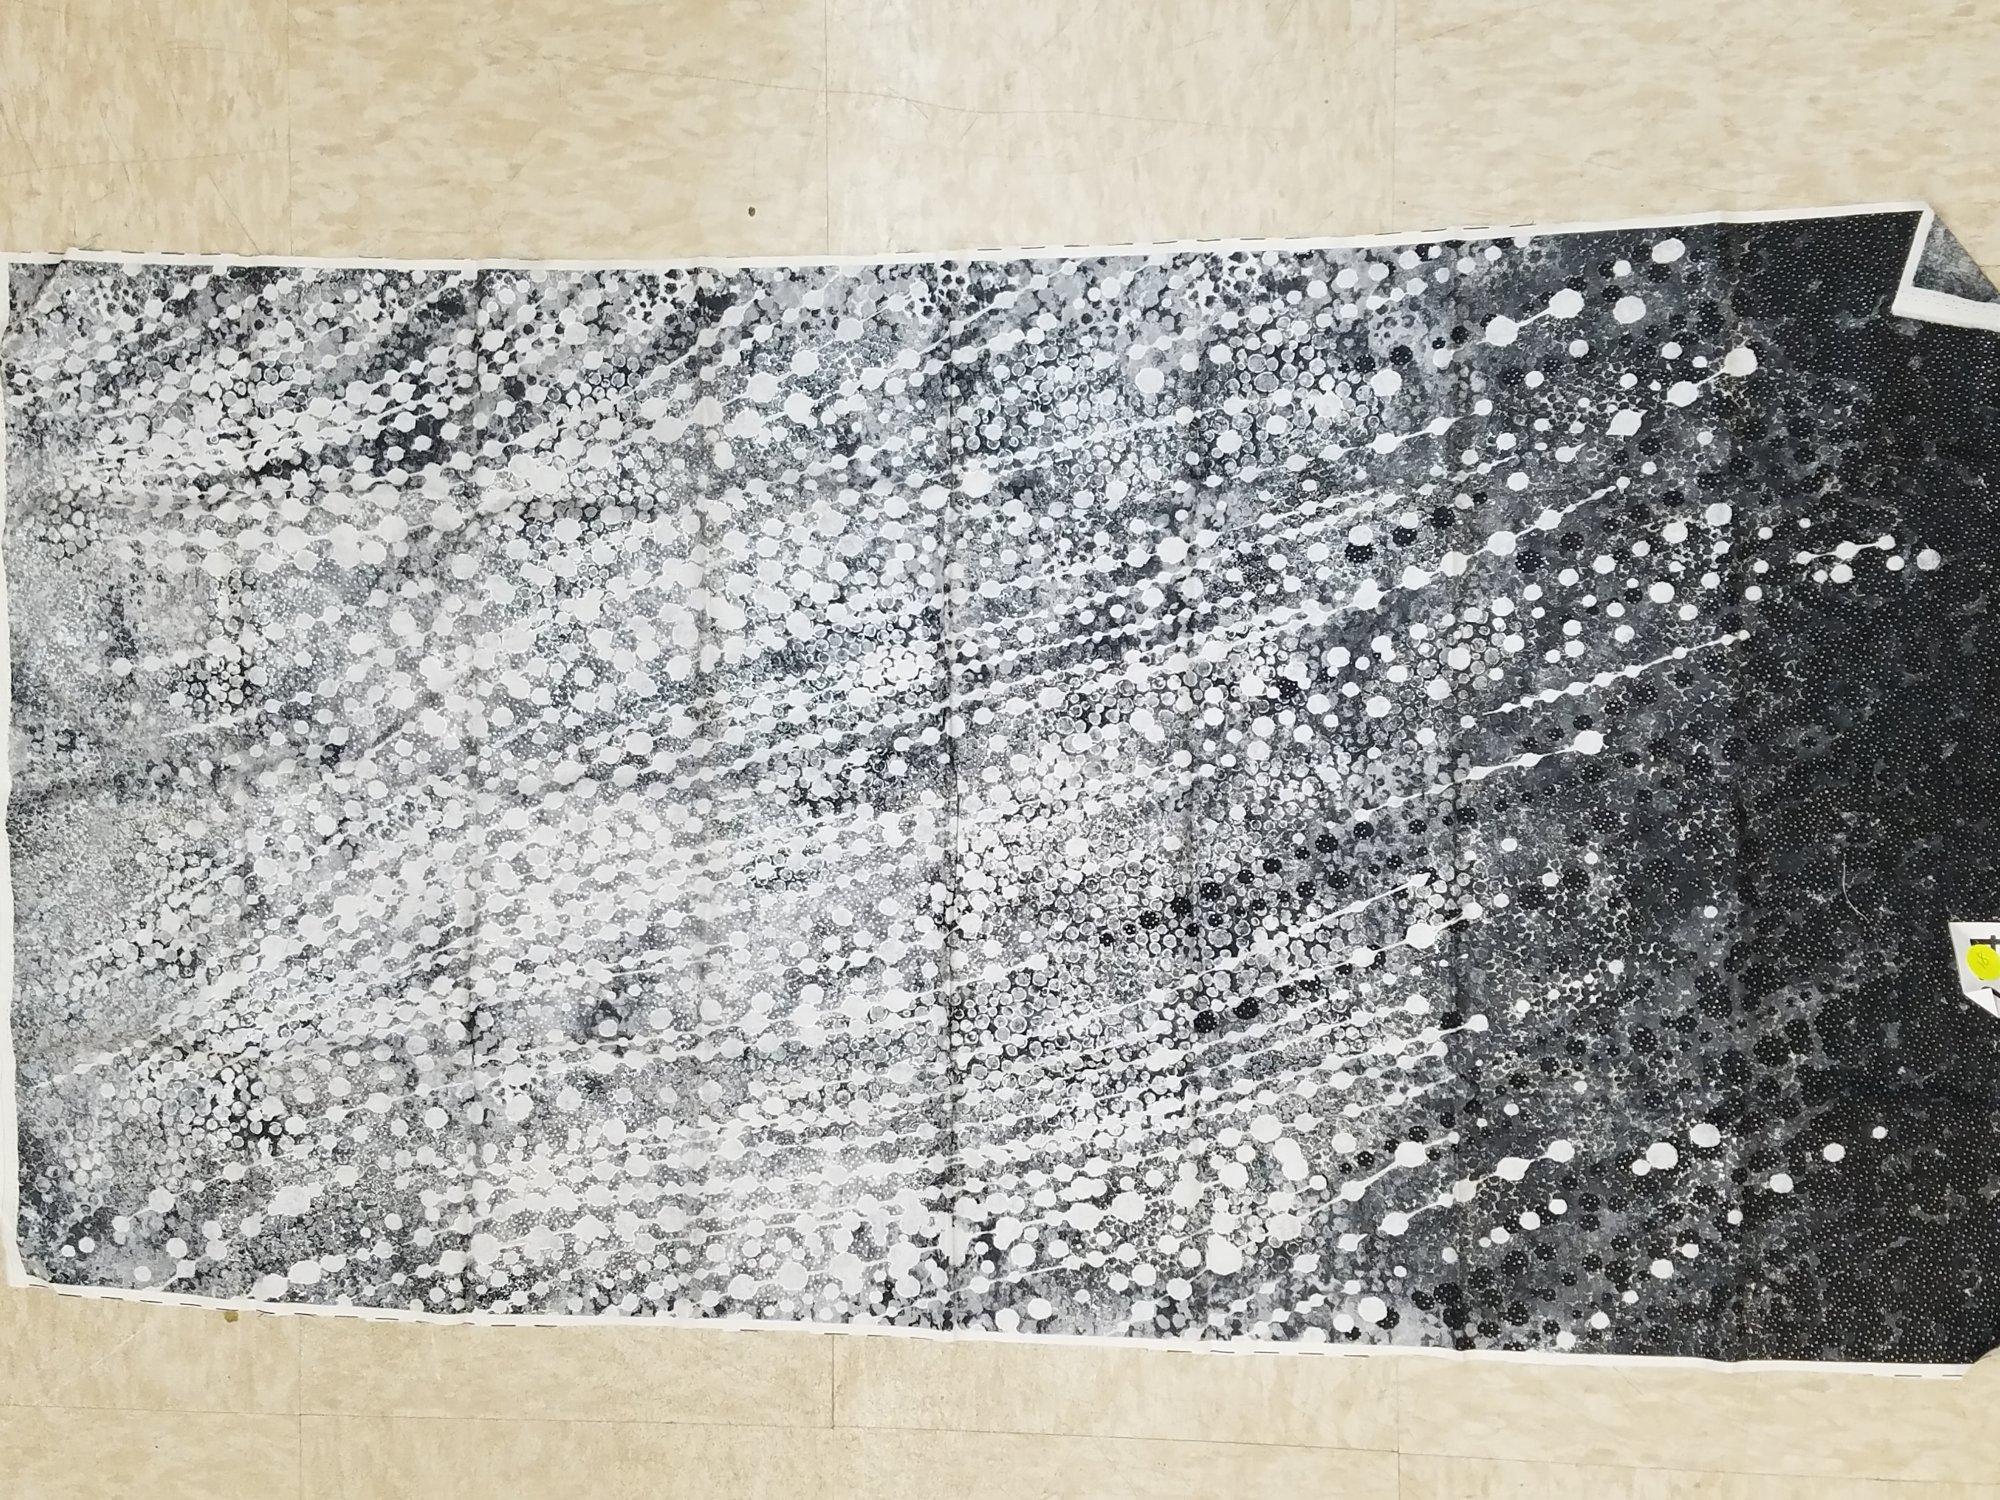 panel 234 shimer echos black